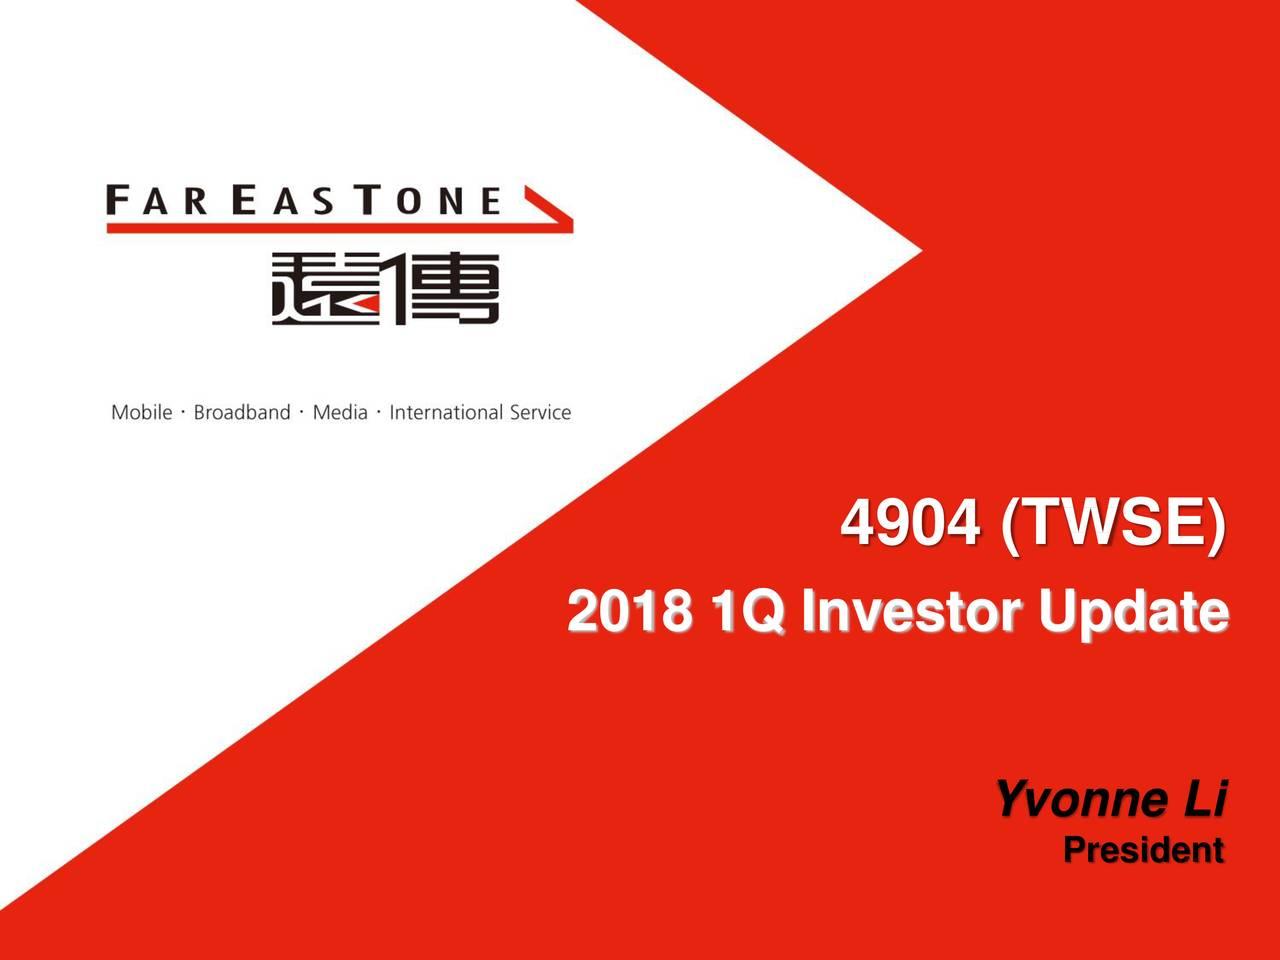 2018 1Q Investor Update Yvonne Li President